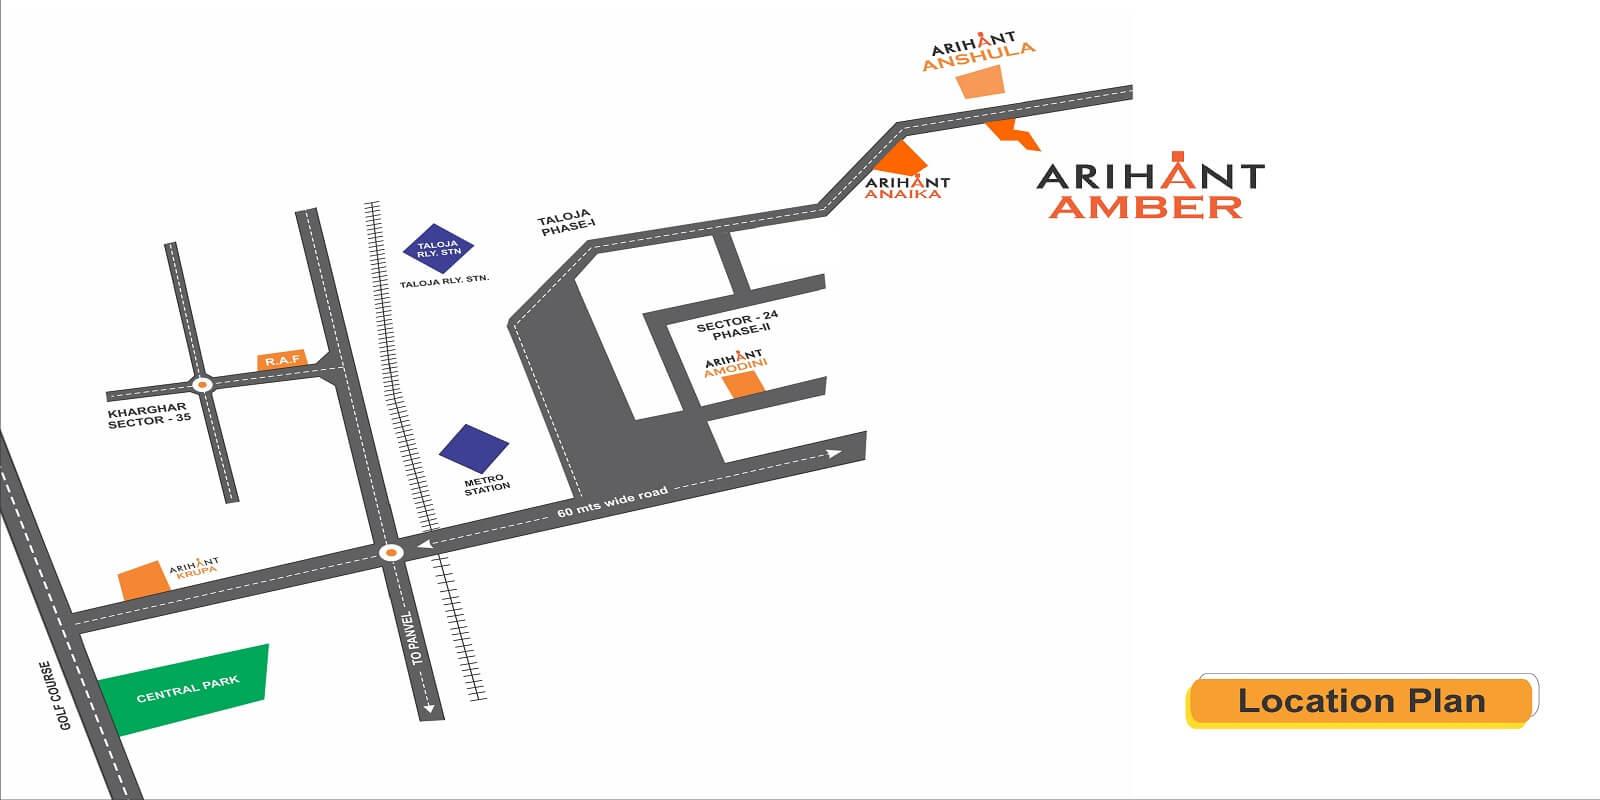 arihant amber location image1